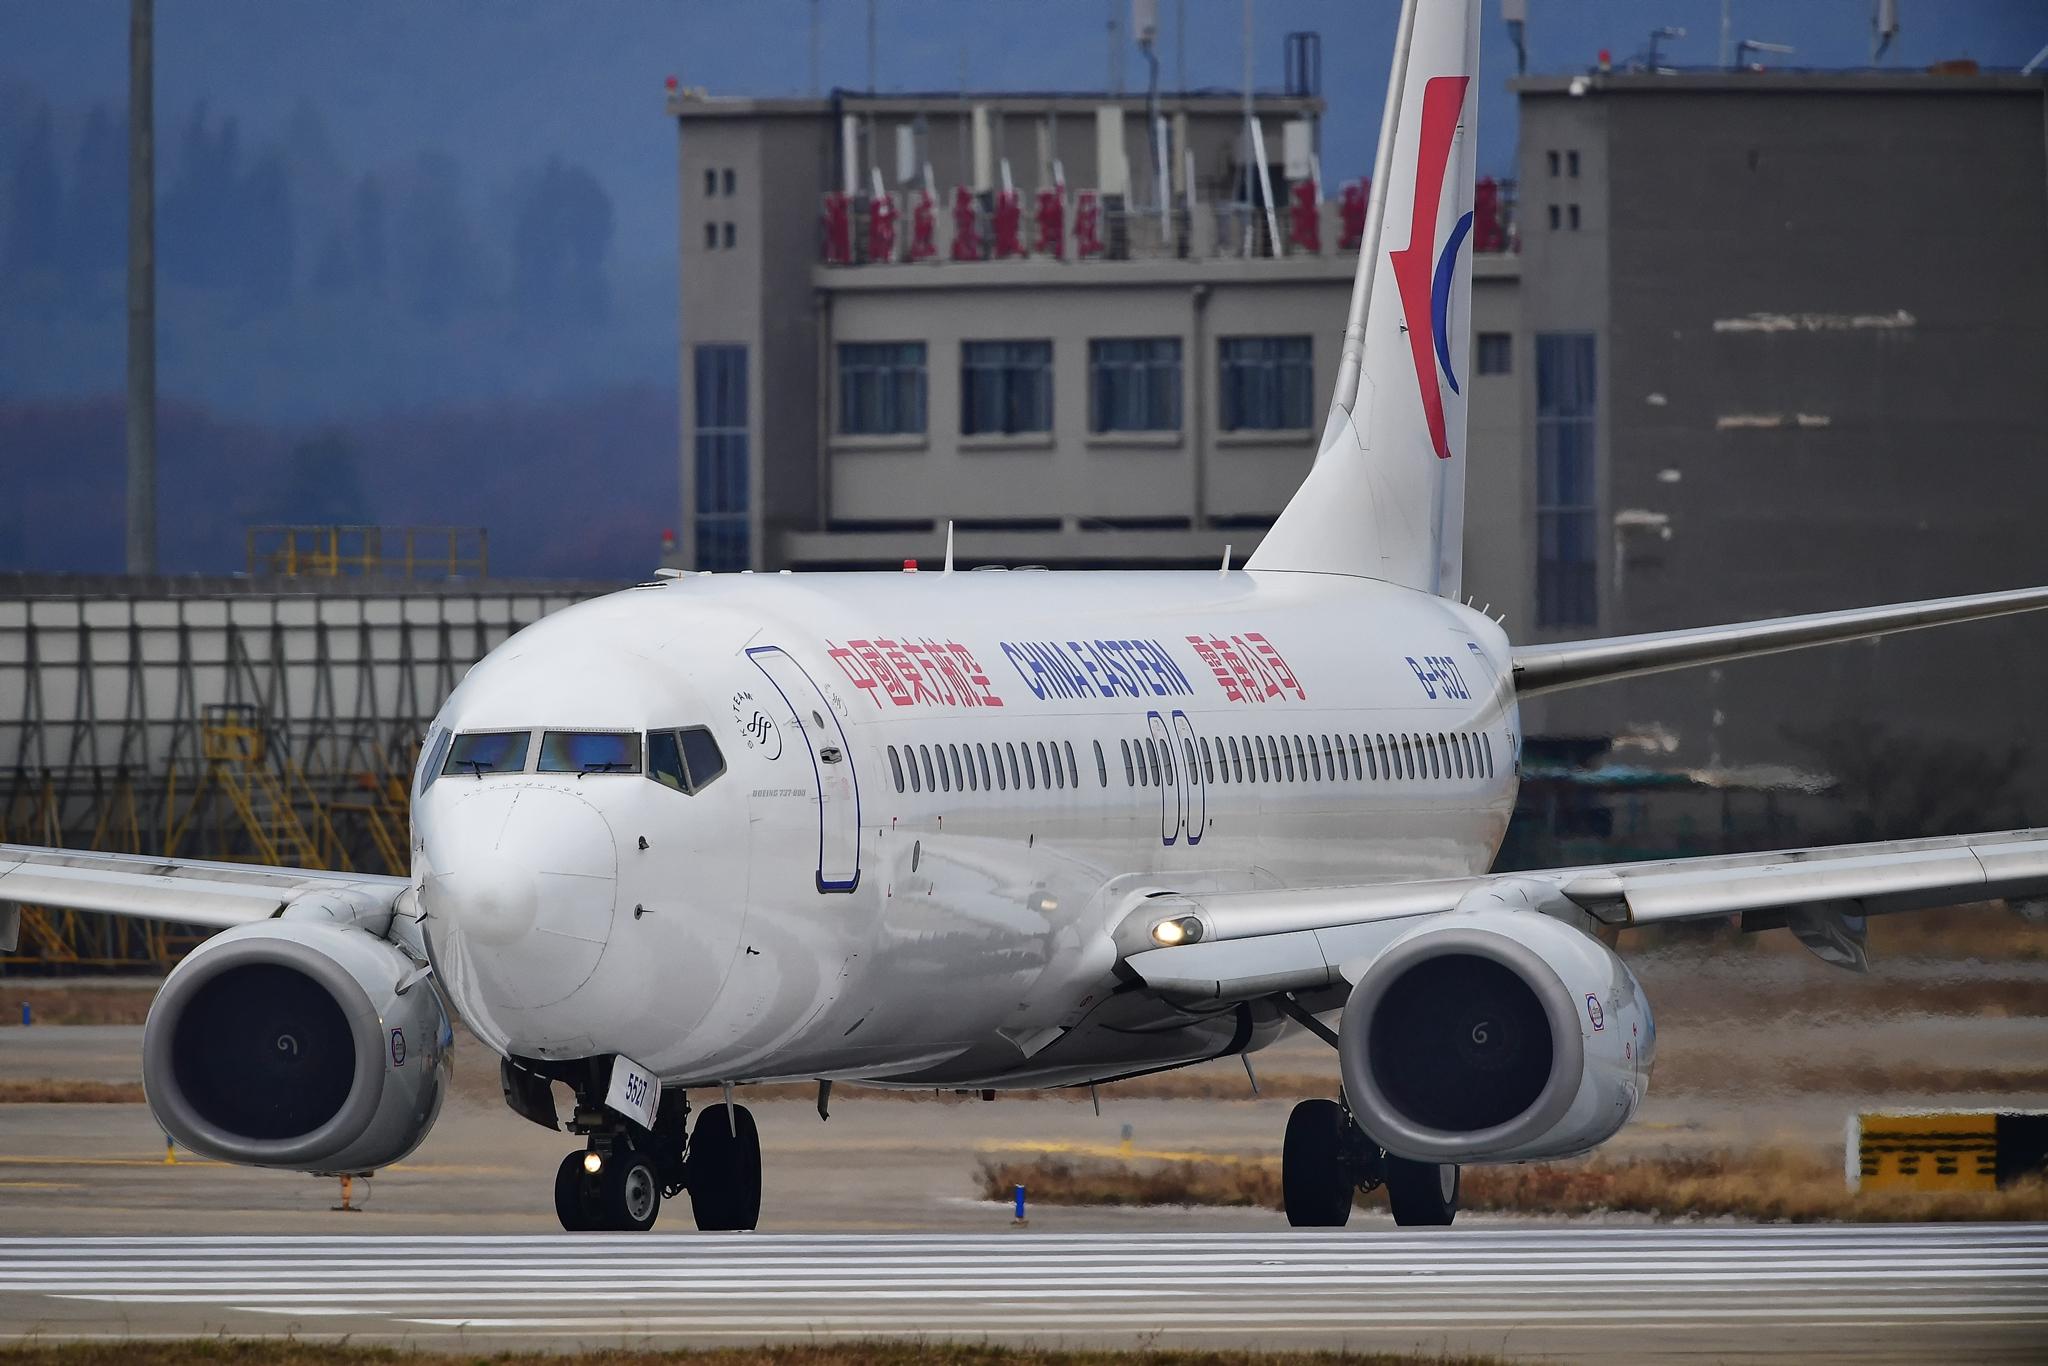 Re:[原创]KMG 庚子年初四再赴长水之约 都是似曾相识 都是熟悉的味道 BOEING 737-800 B-5527 中国昆明长水国际机场